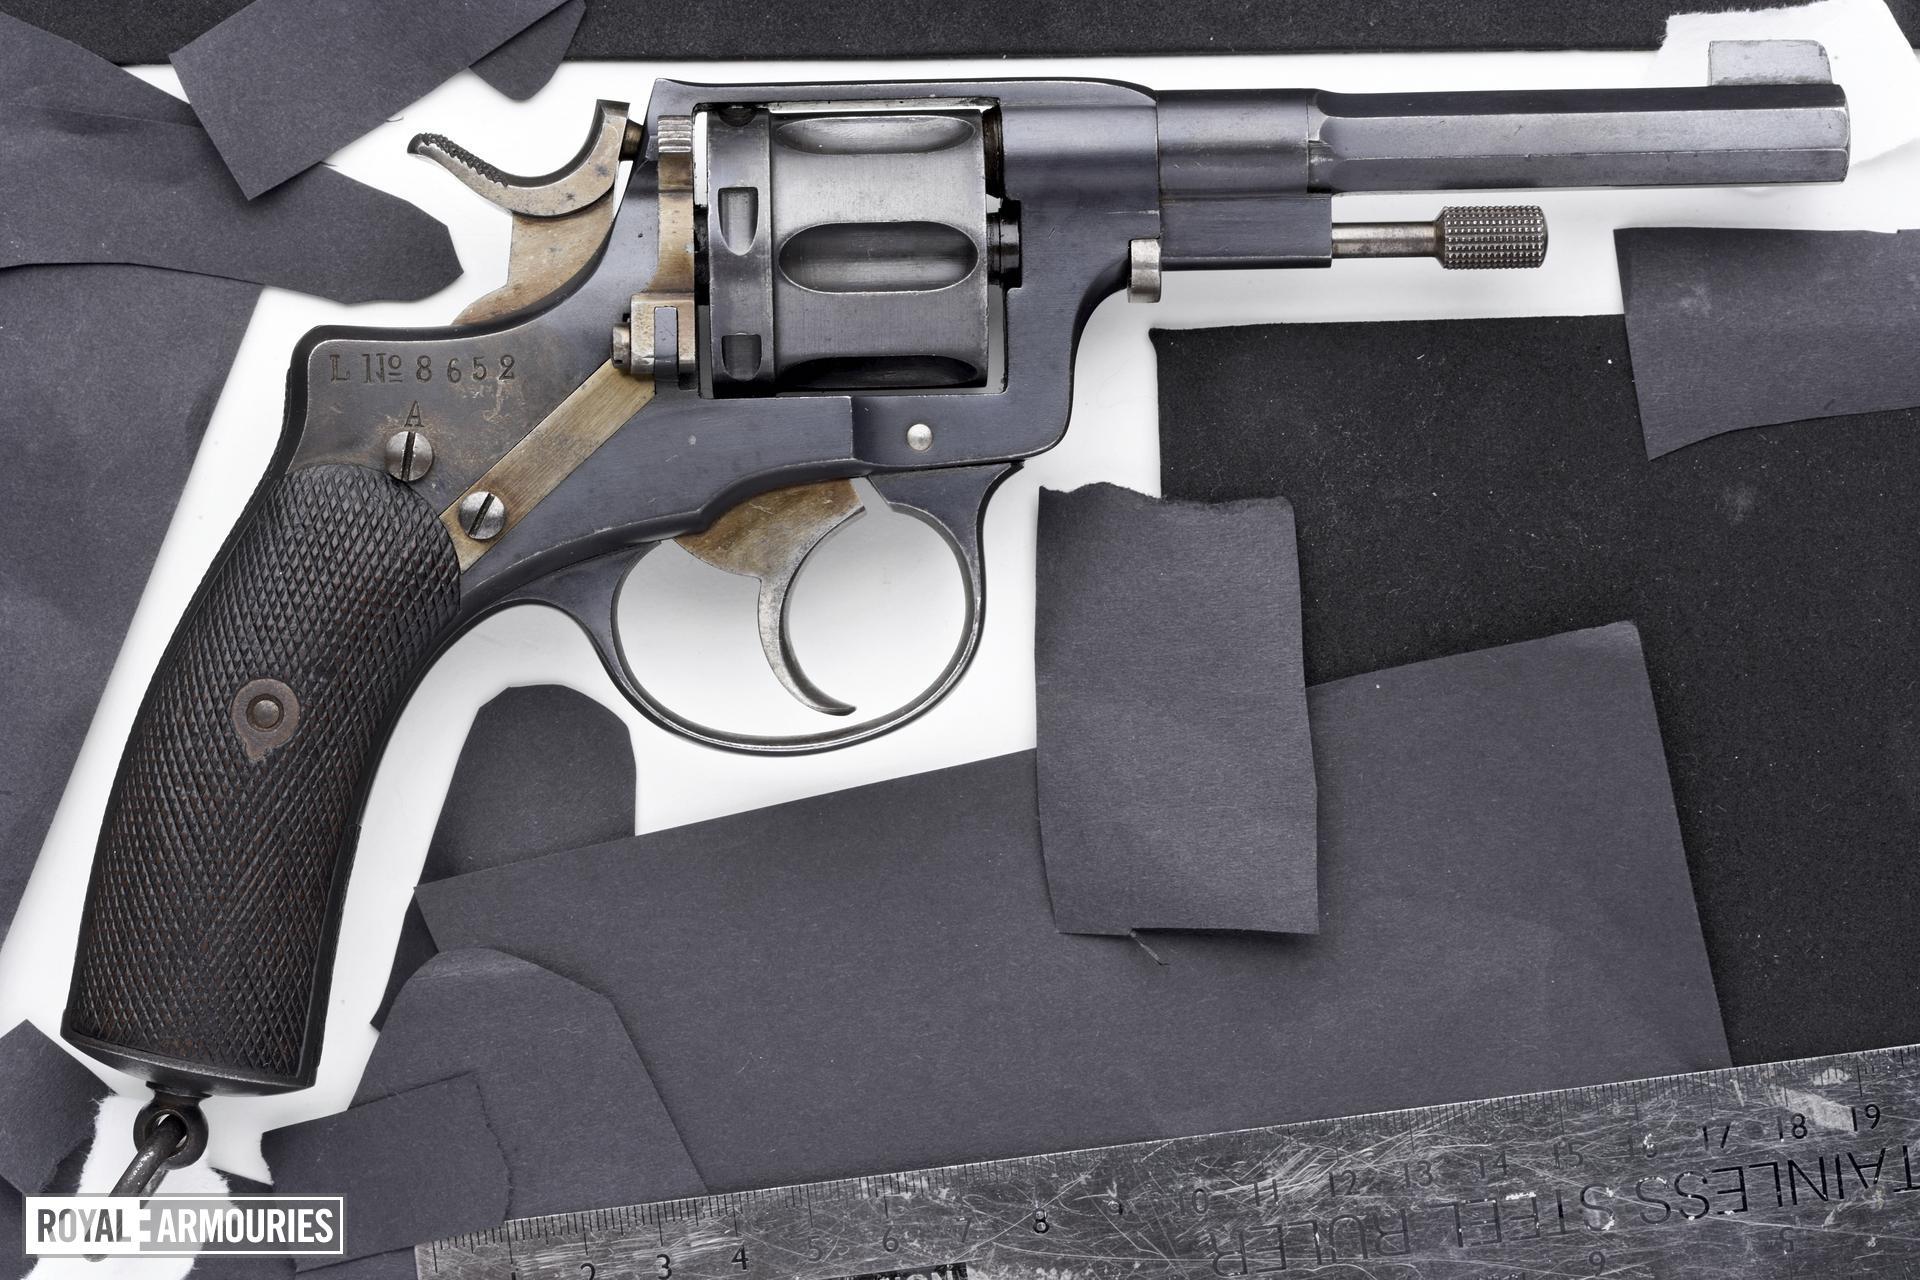 Centrefire six-shot revolver - Nagant Model 1887 - Royal